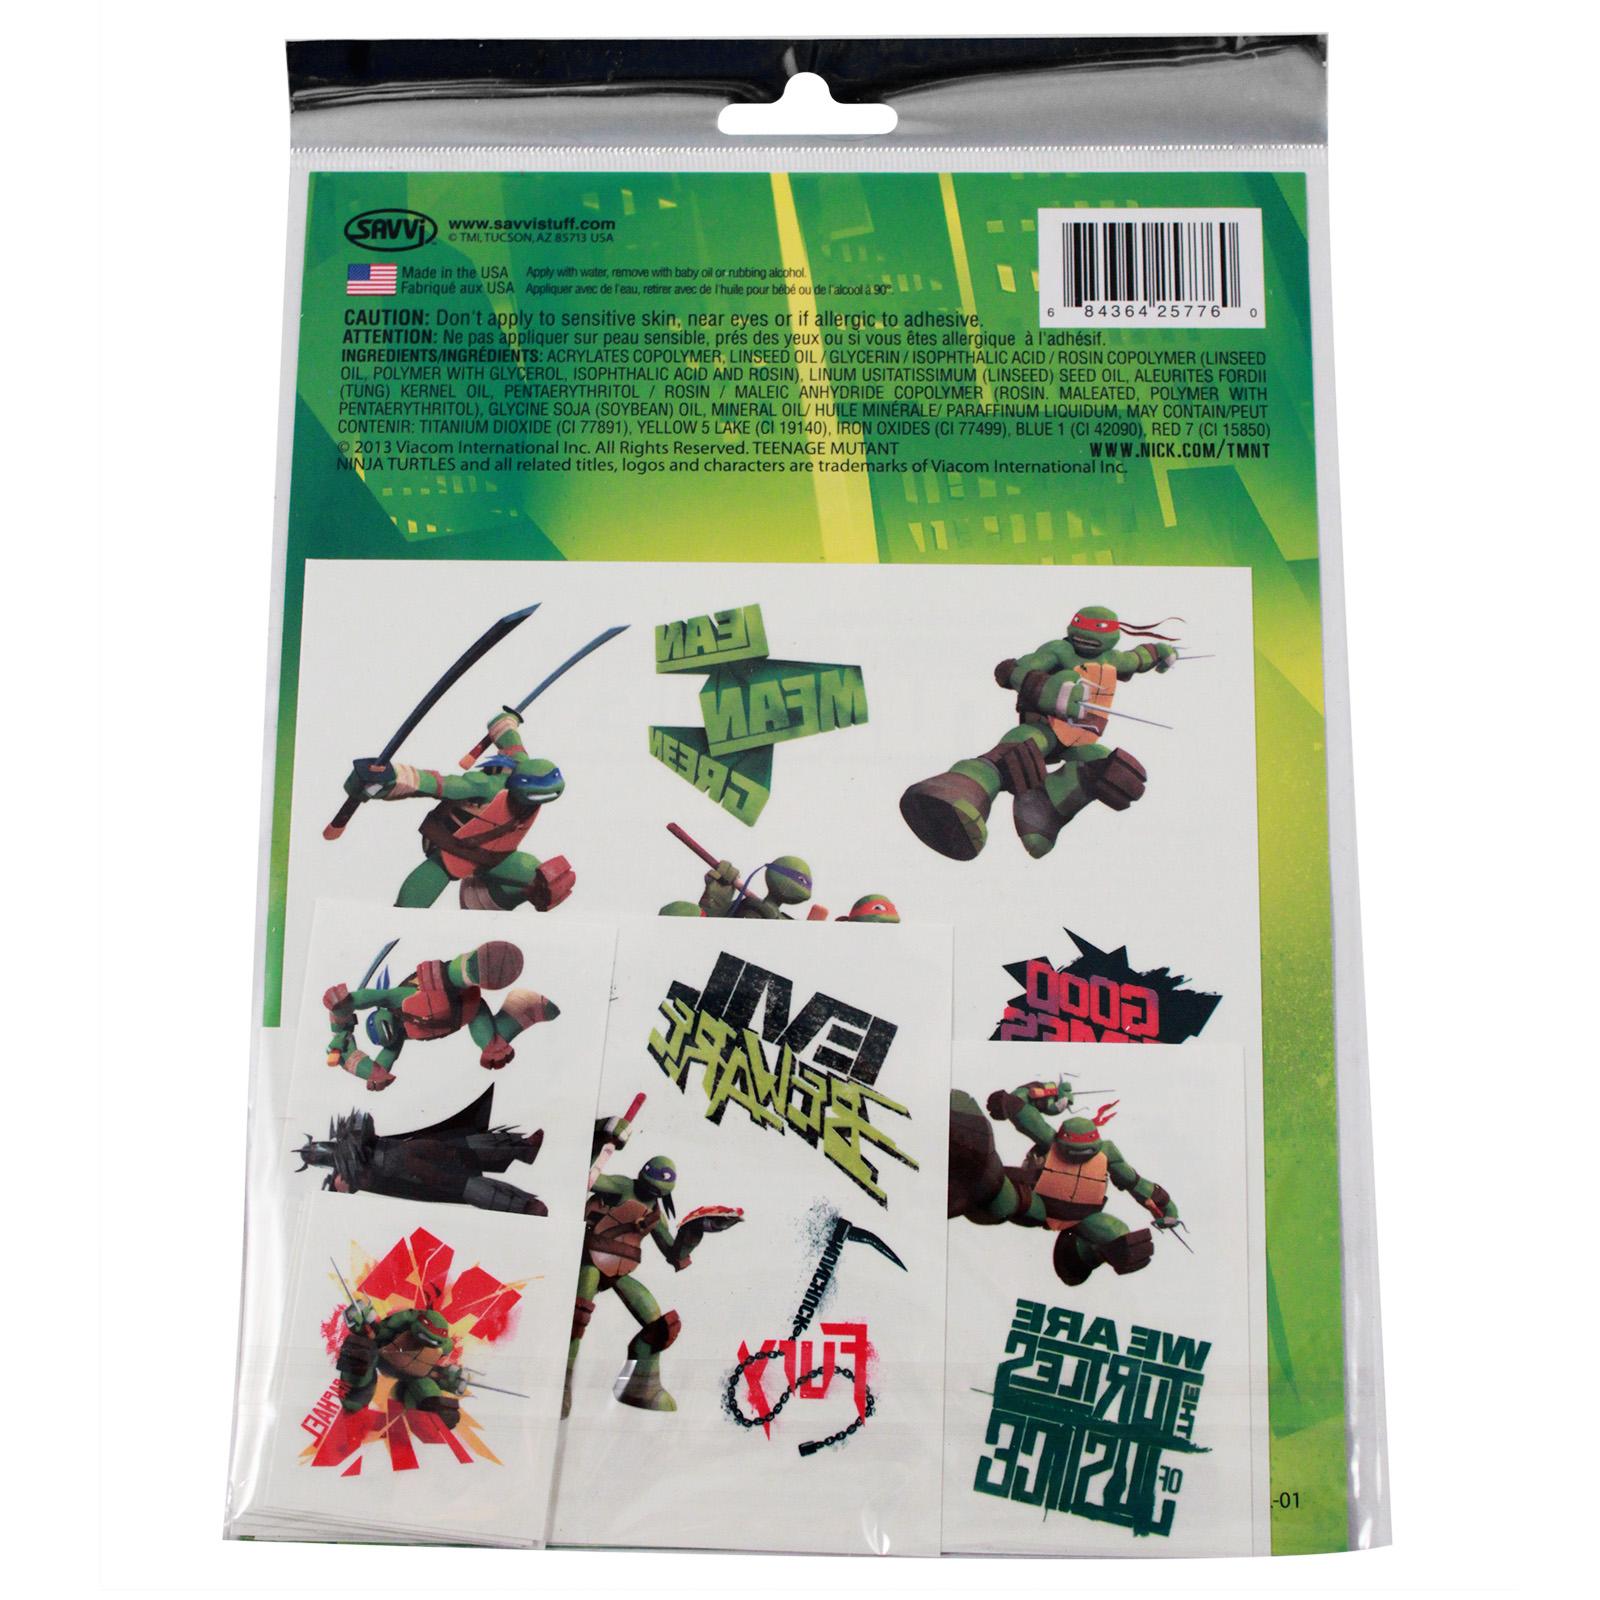 Teenage Mutant Ninja Turtles Temporary Tattoos 25pc Set Kids Party Favor Toy